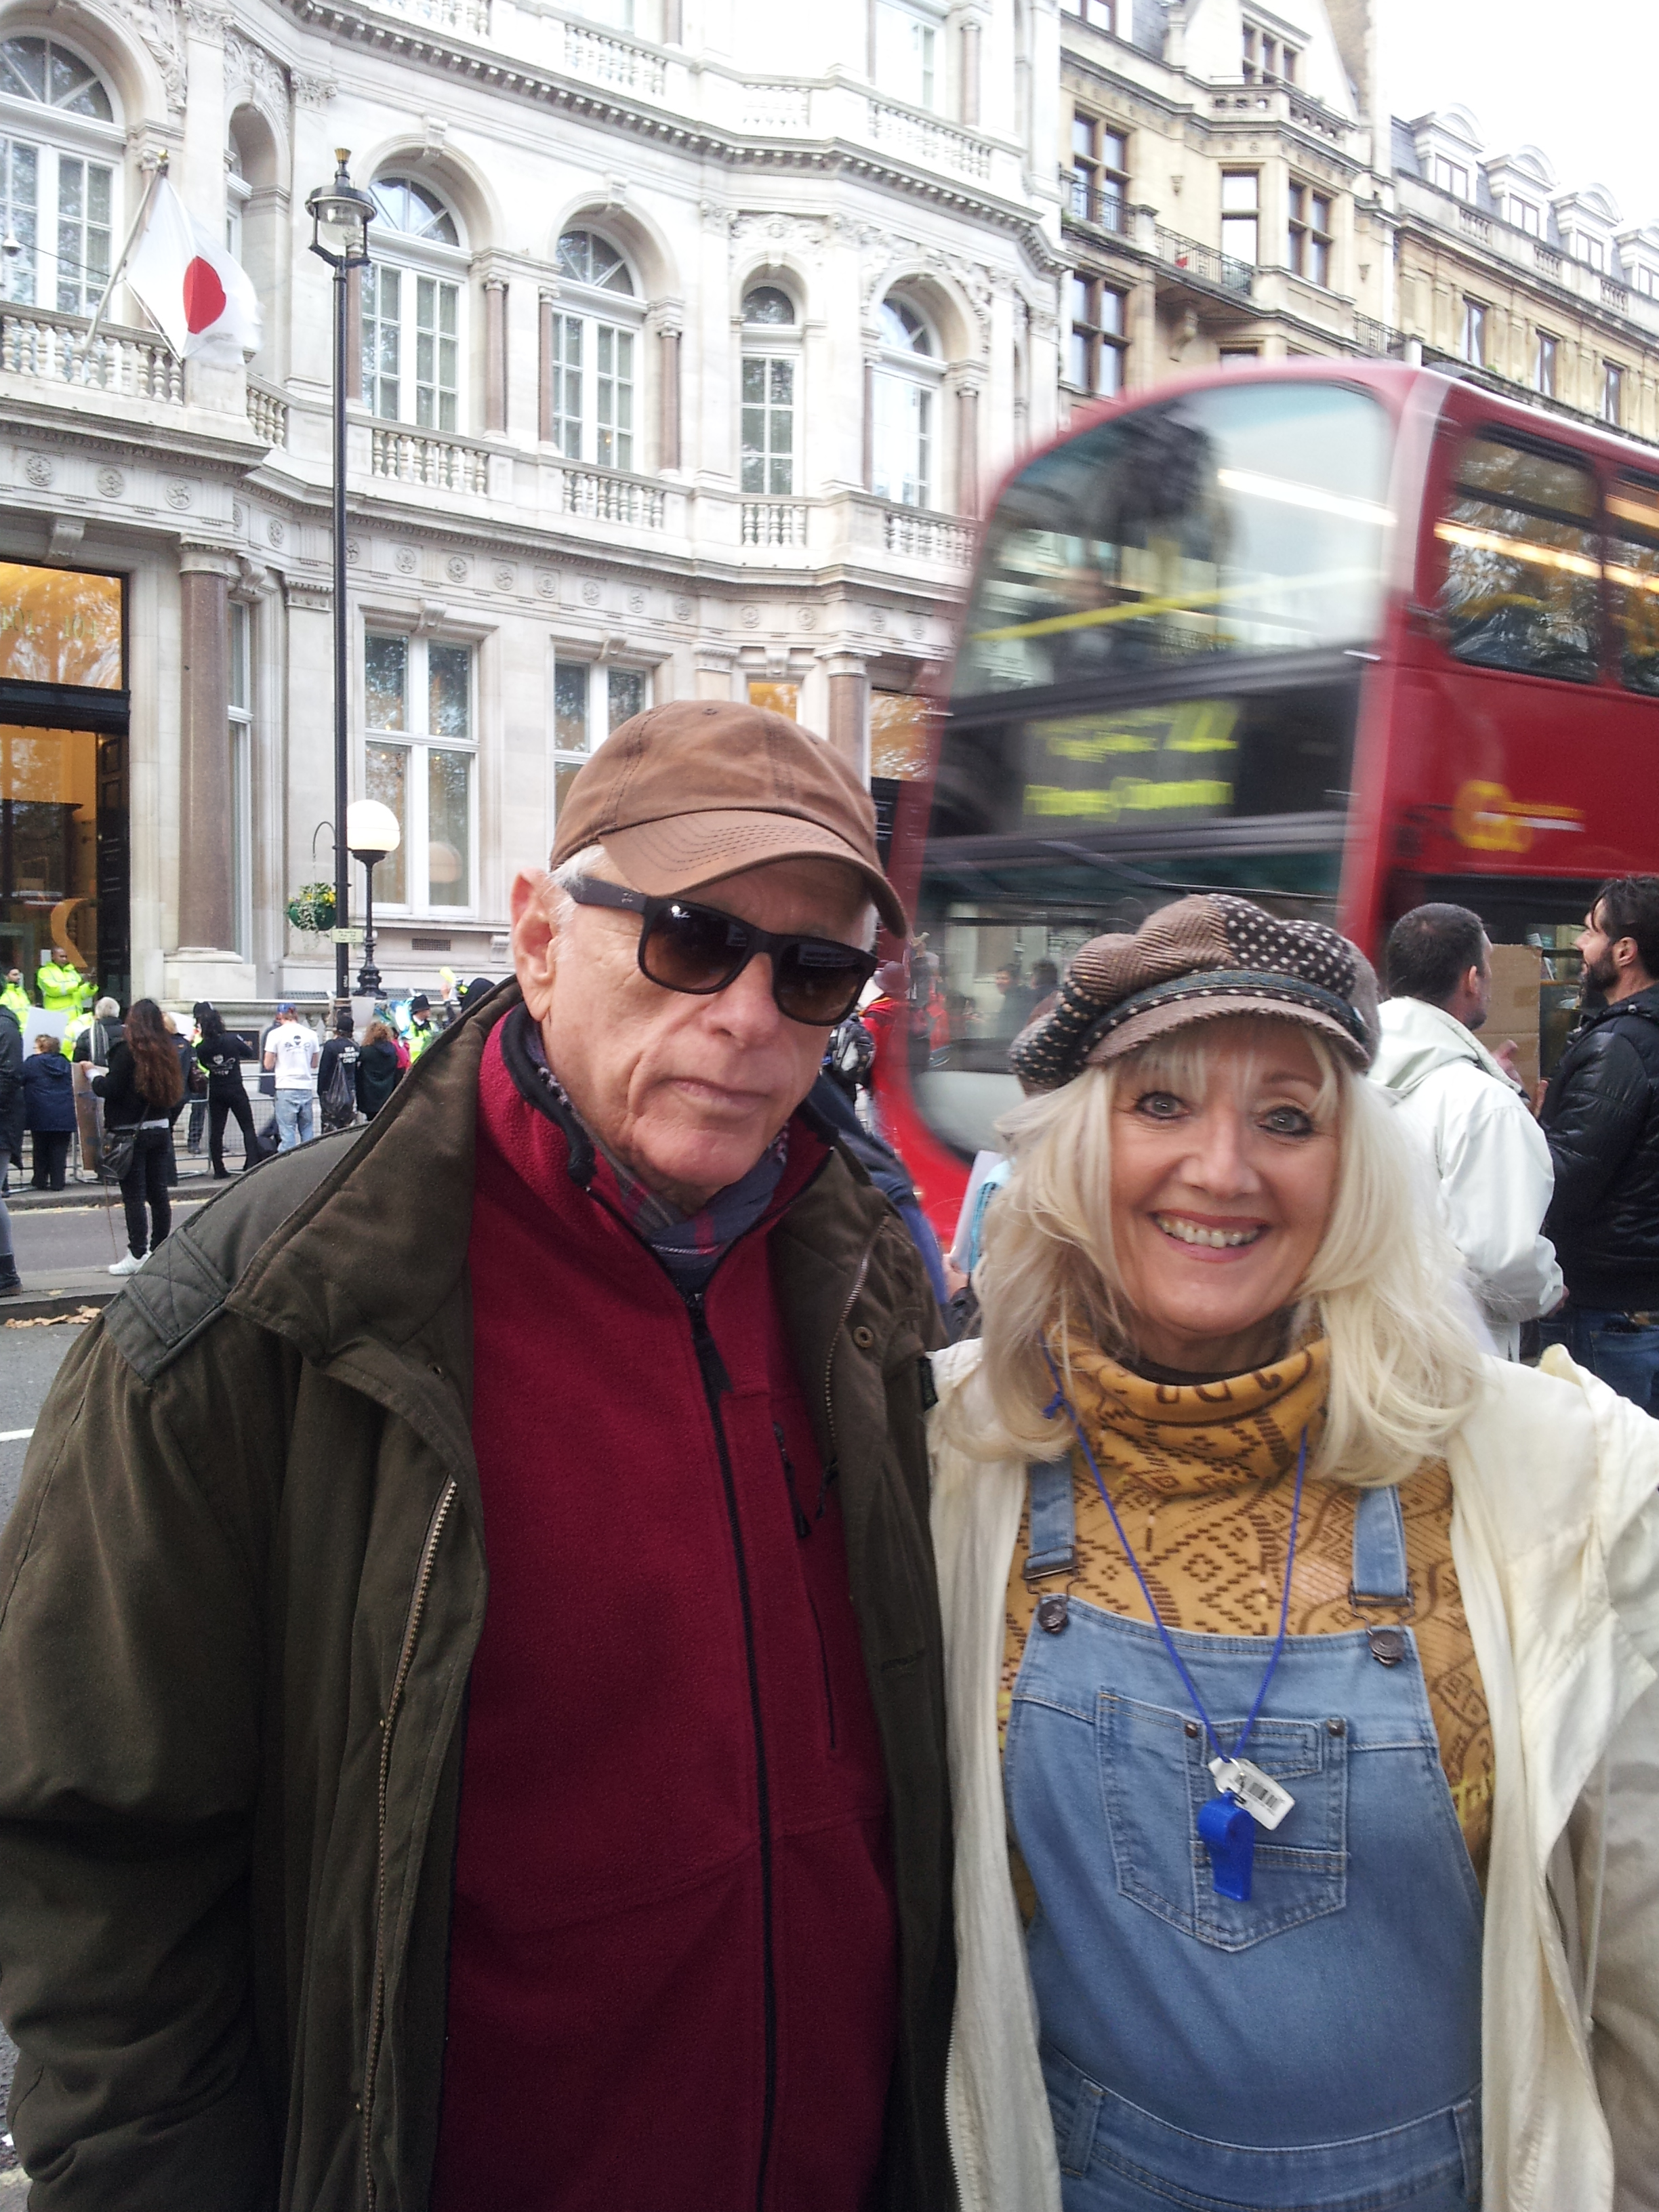 Ric O' Barry & Sharon Bull